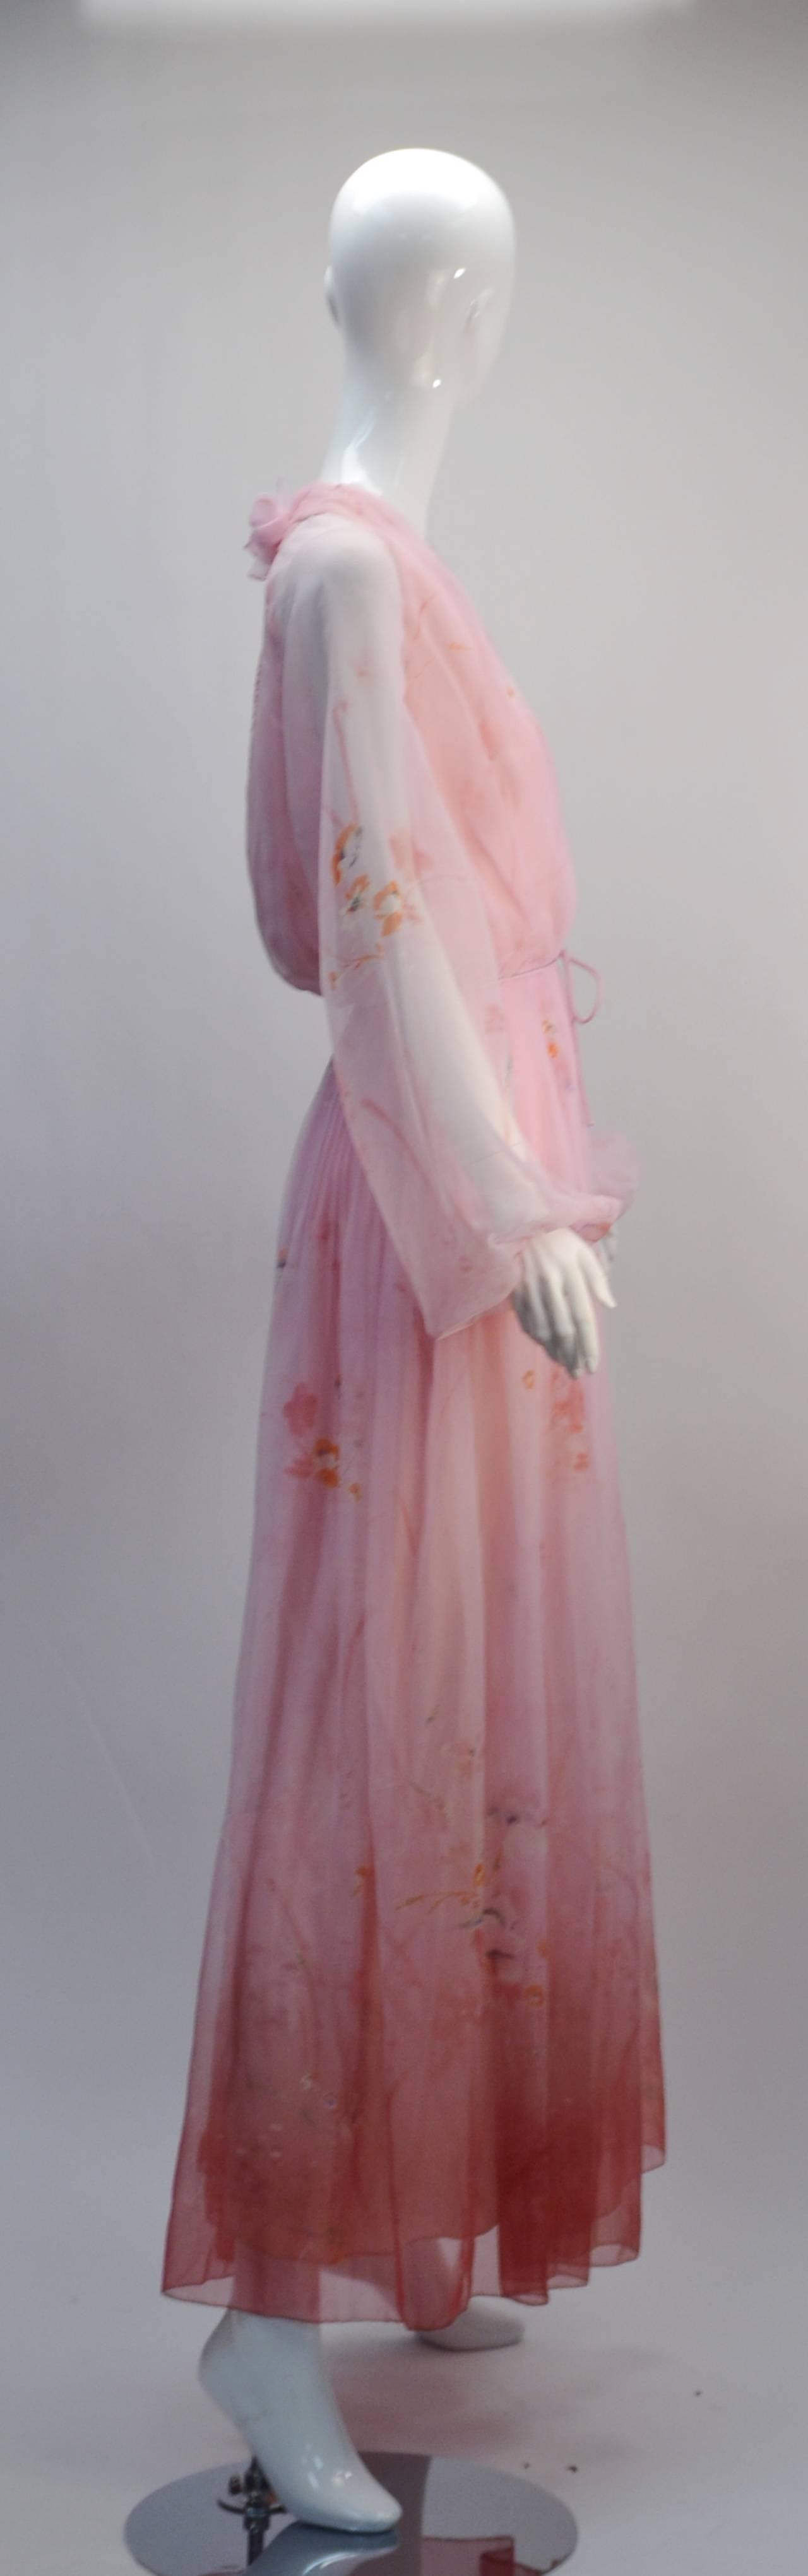 Brown 1970s Lillie Rubin Pink Sheer Dress For Sale